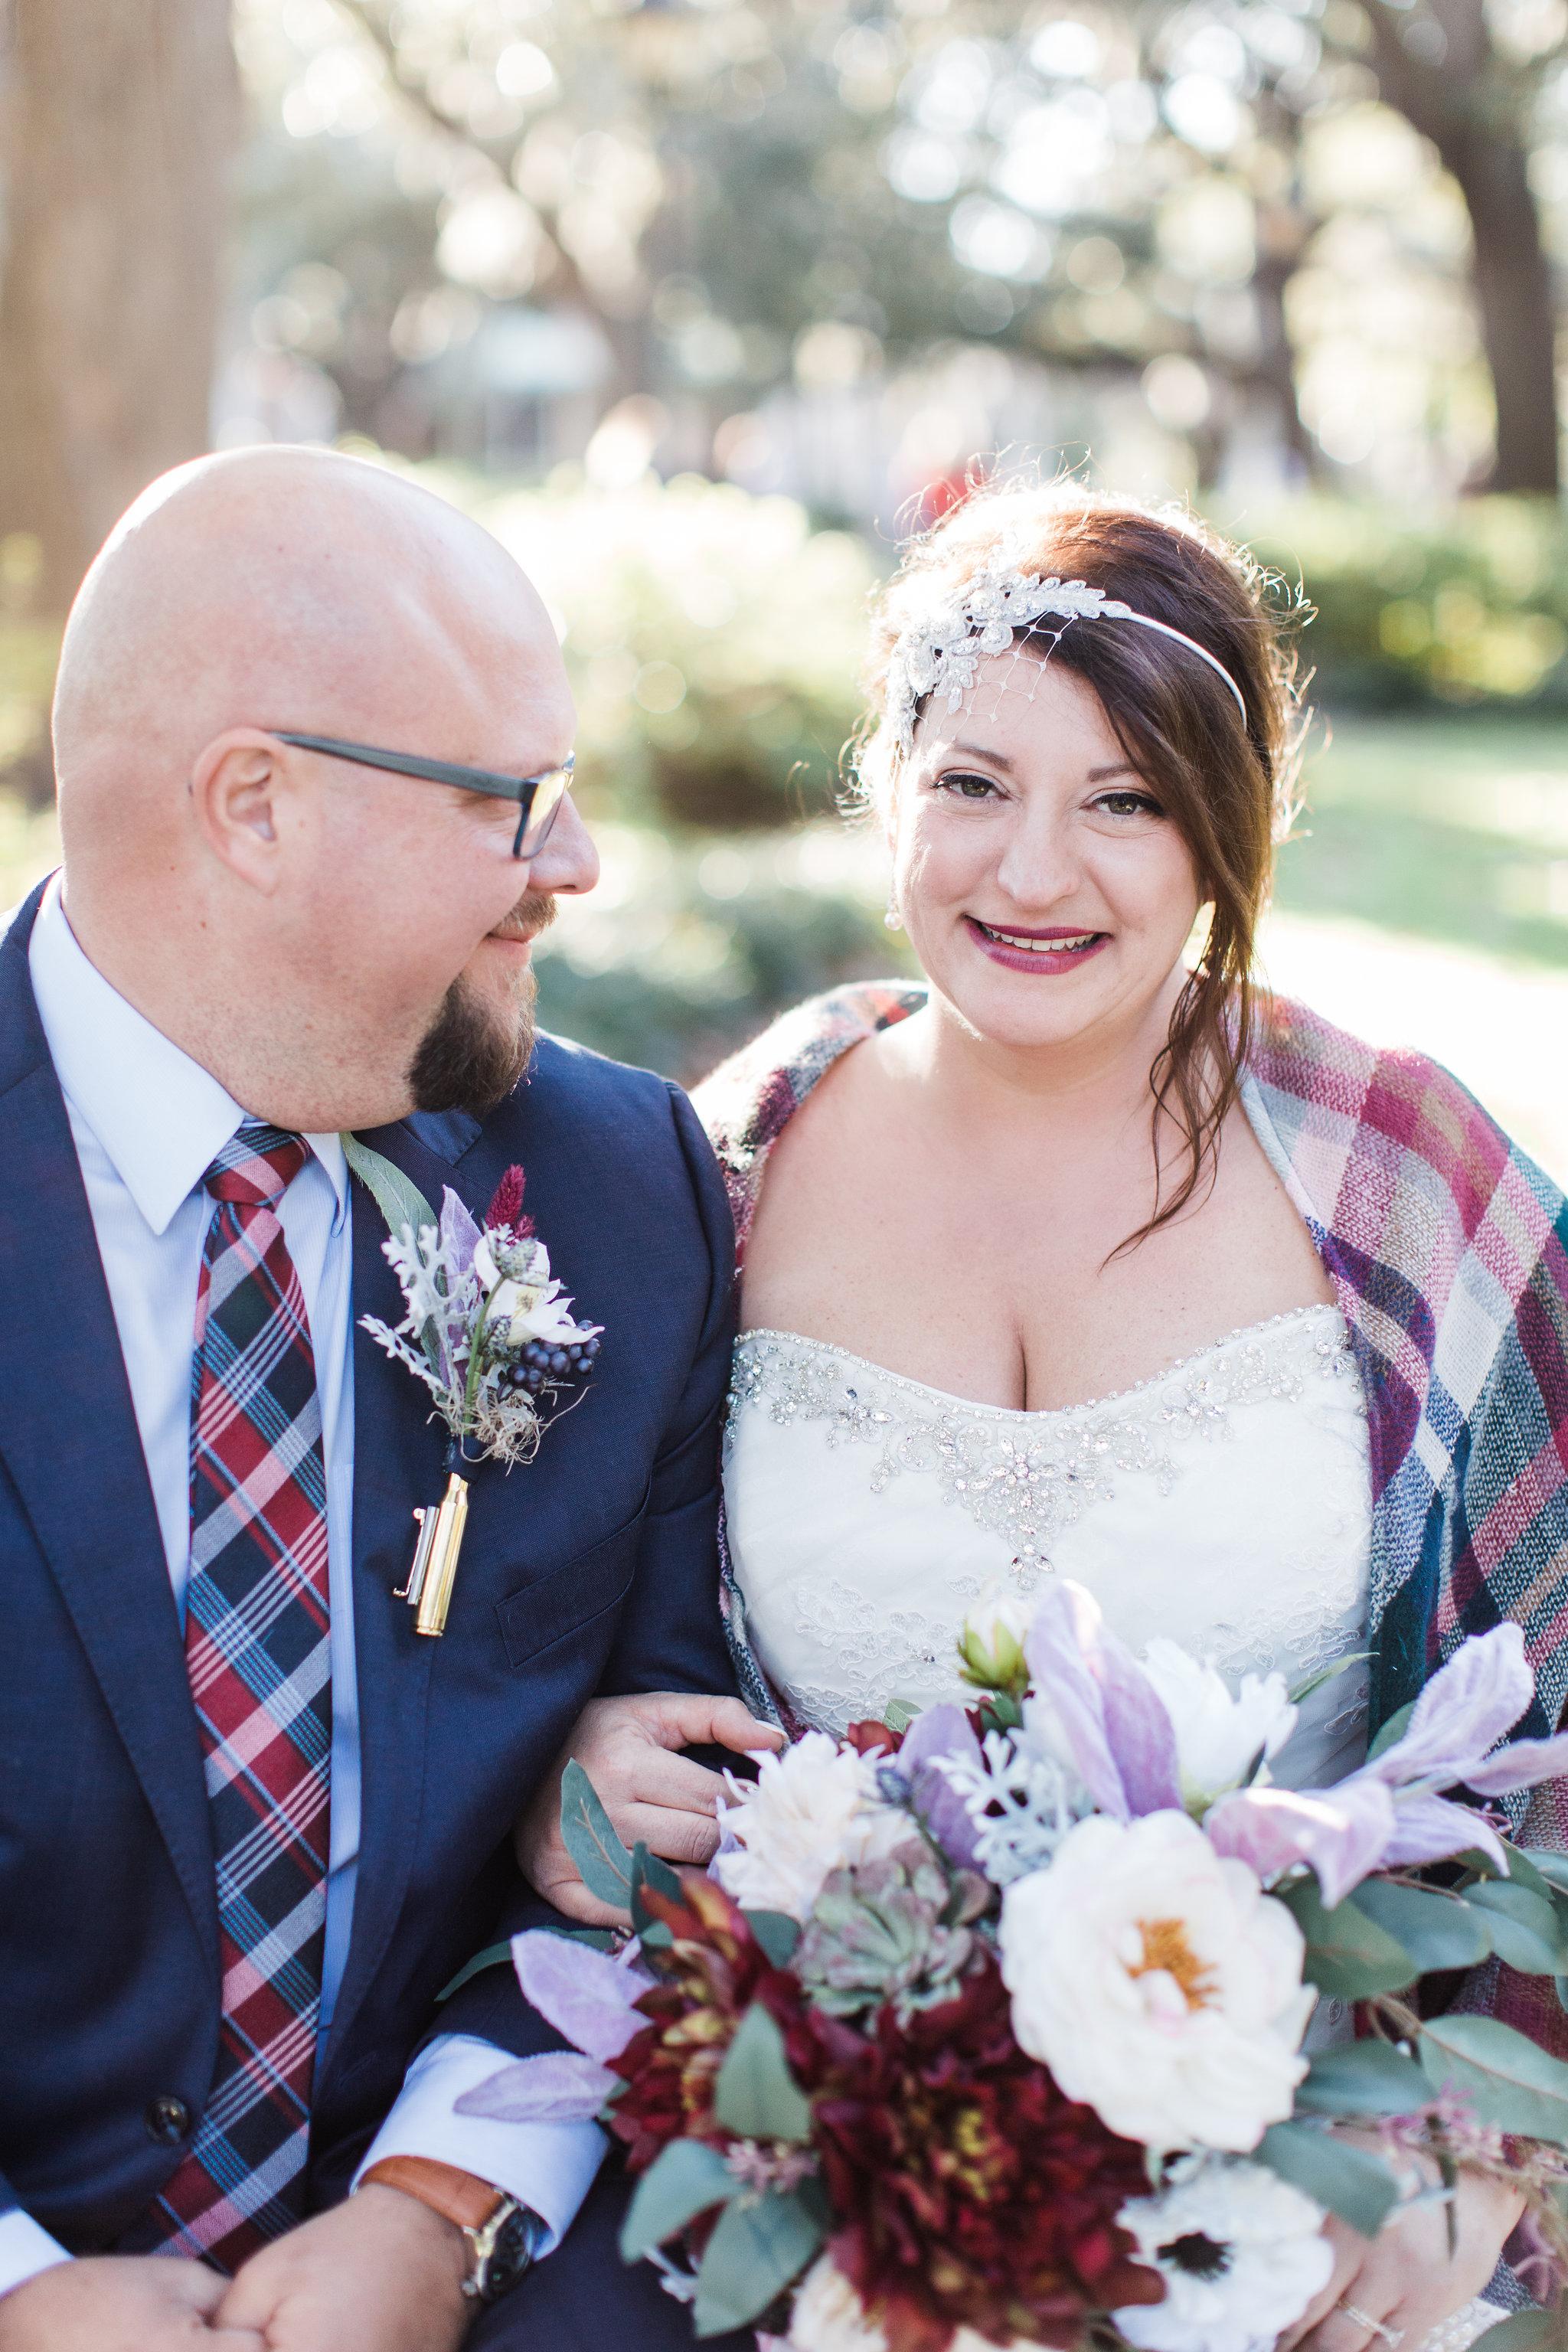 apt-b-photography-kristy-rob-wormsloe-elopment-savannah-wedding-photographer-savannah-elopement-wormsloe-wedding-historic-savannah-elopement-photographer-savannah-fall-wedding-36.jpg